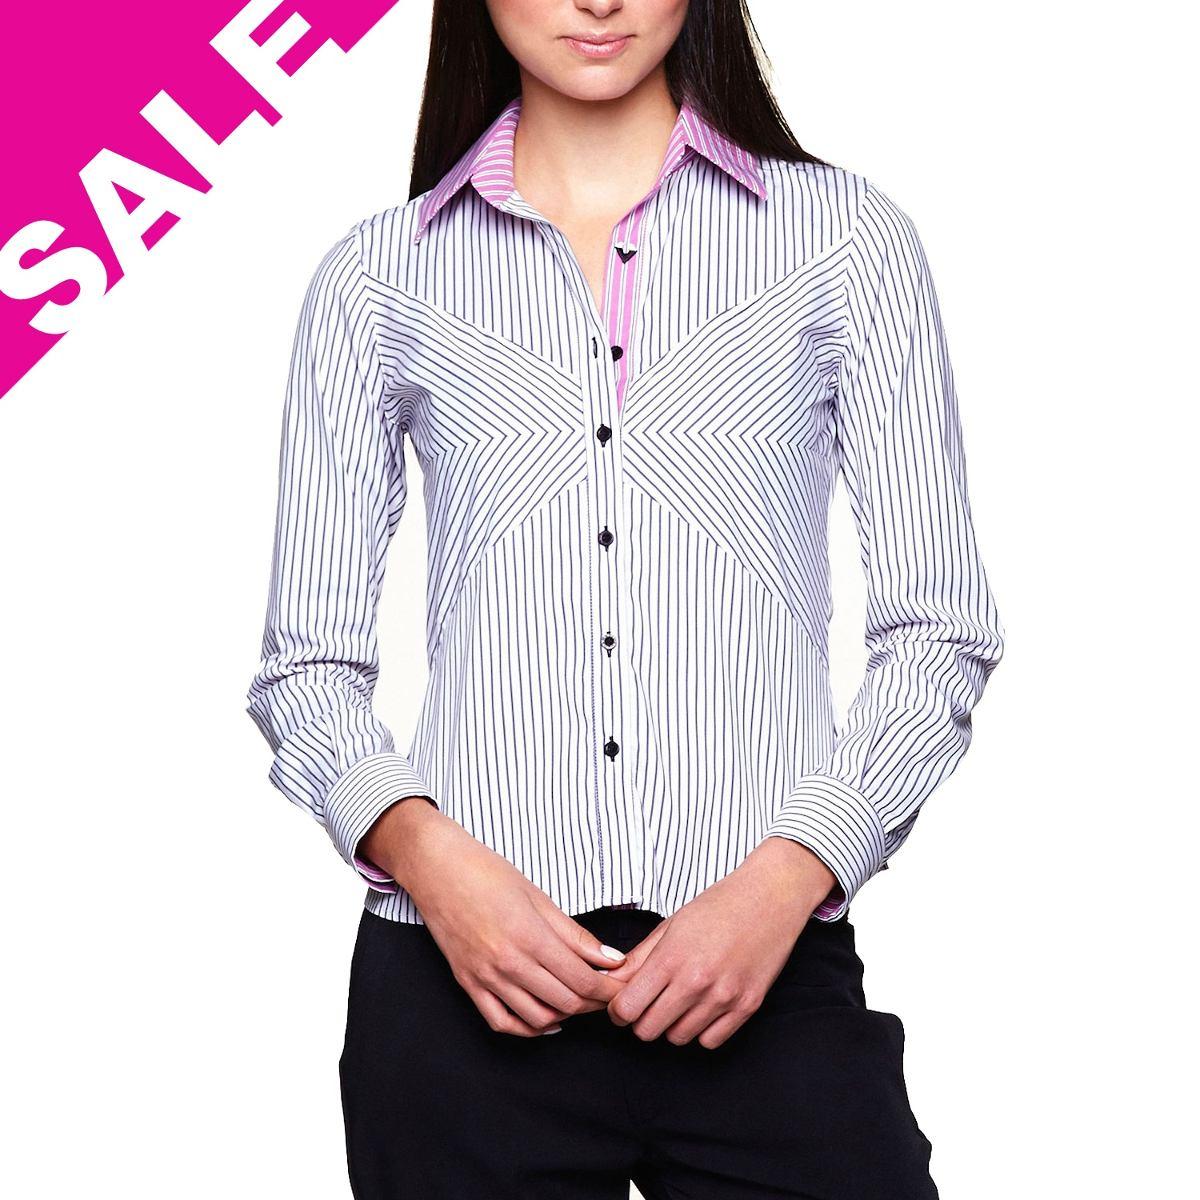 Bolsa Listrada Preta E Branca : Camisa feminina blusa listrada preta branca manga longa